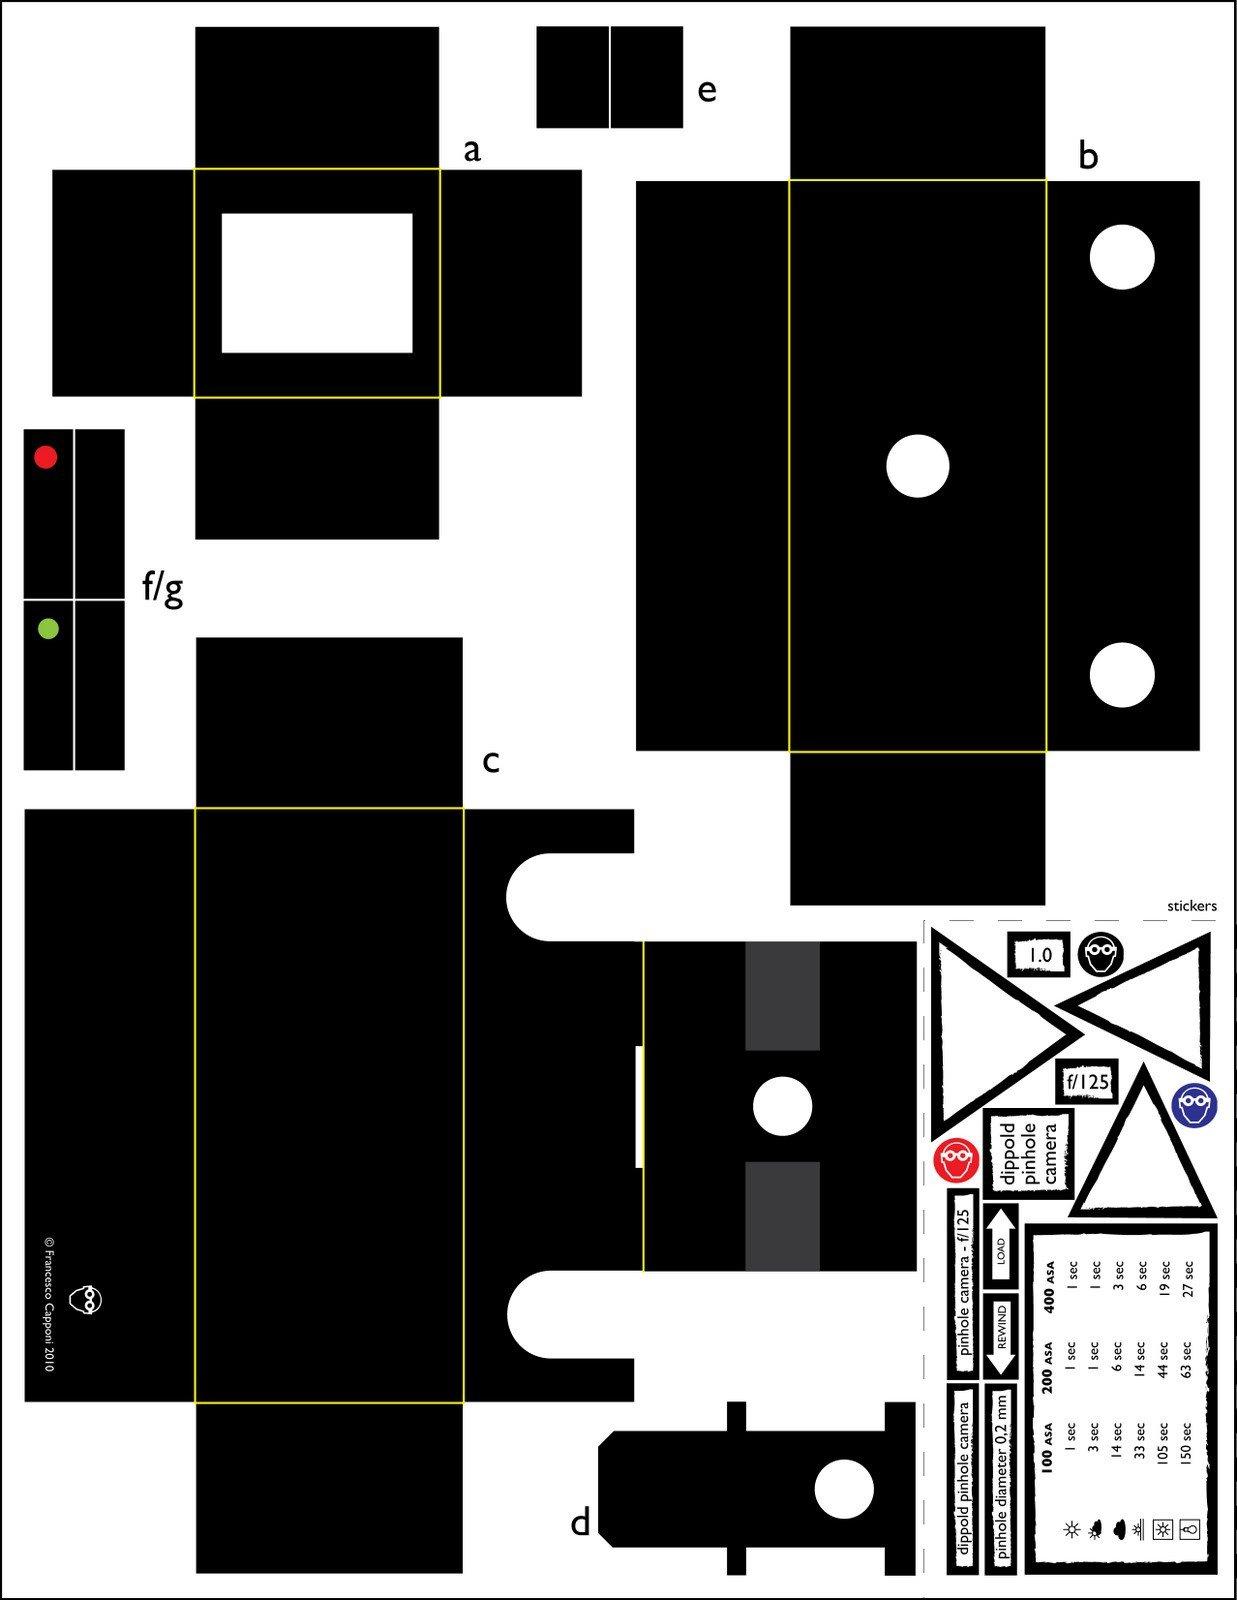 Pinhole Camera Template the Lab Template for A 35mm Pinhole Camera